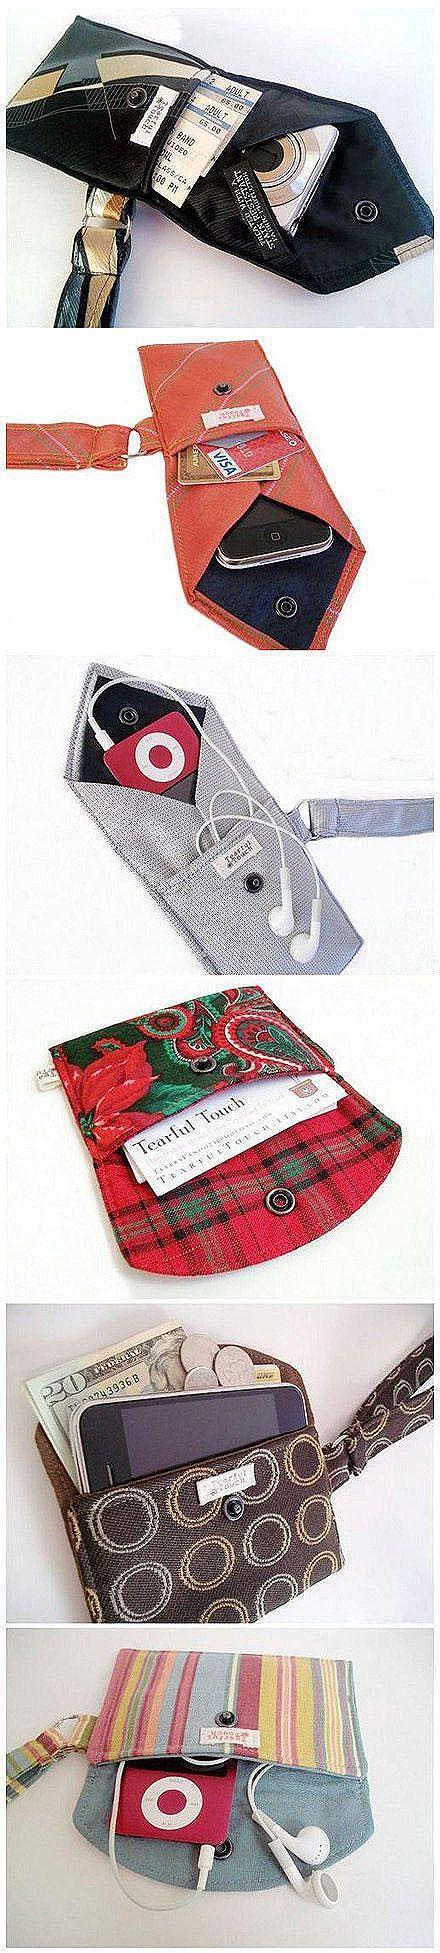 DIY tie-wallet-hmm my old Olive Garden ties I wonder...